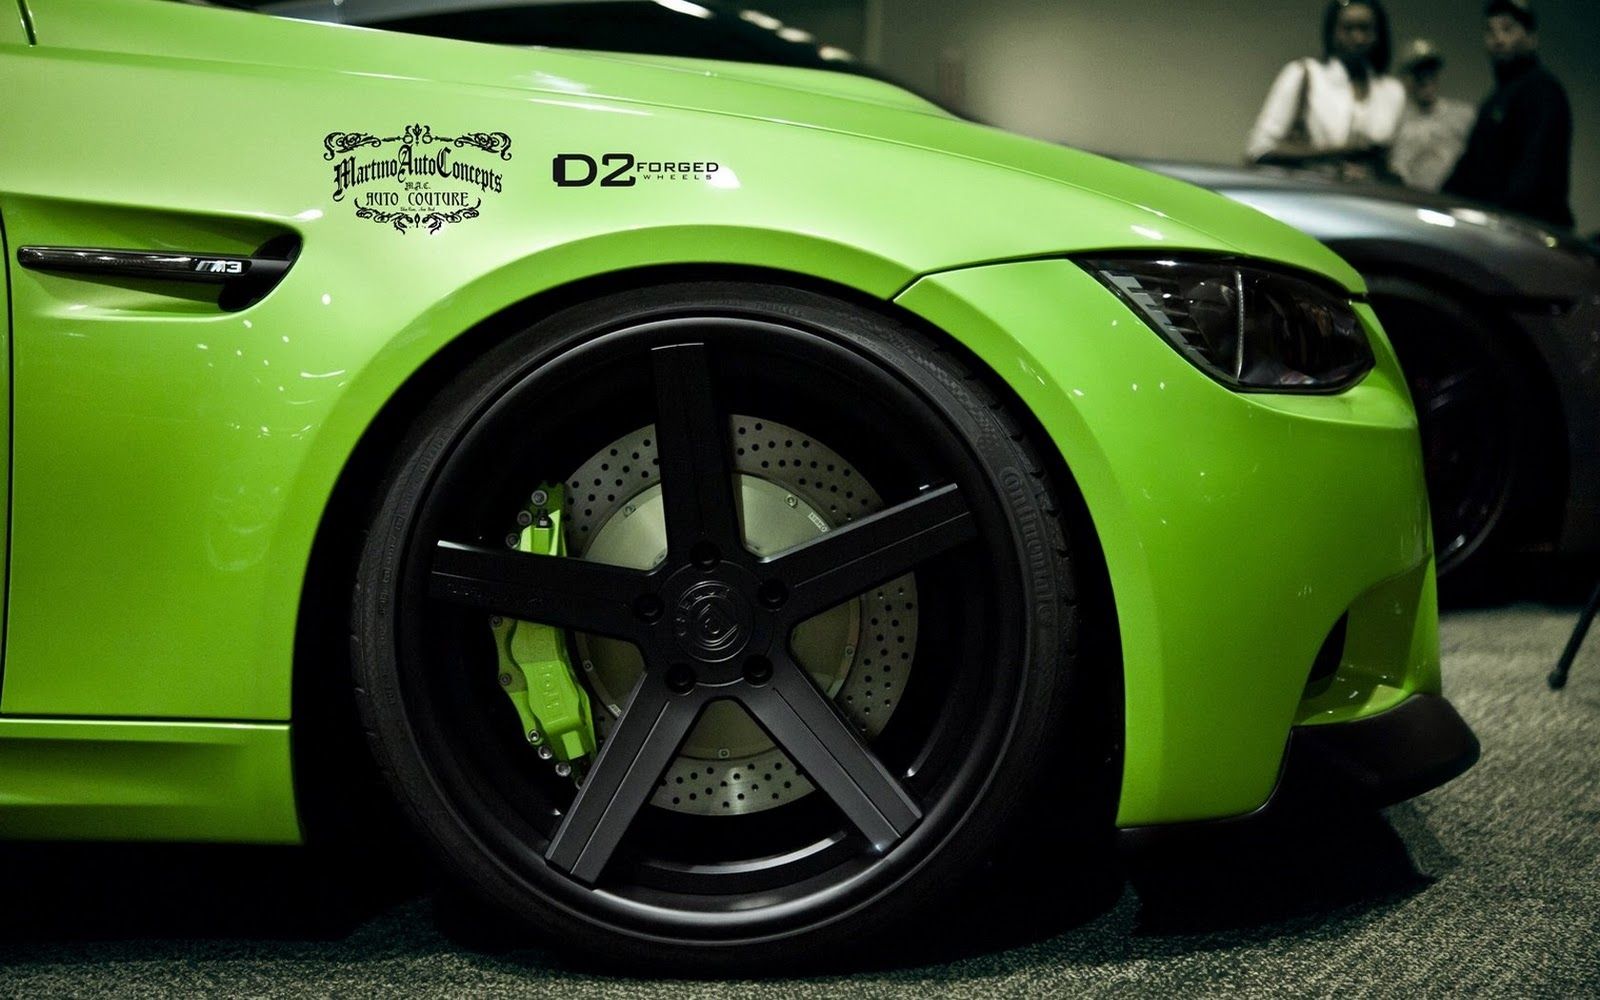 http://1.bp.blogspot.com/-V3y3cC8d4F8/TobjP4P2ItI/AAAAAAAAARo/ULNTIQJyIkE/s1600/Green+BMW.jpg